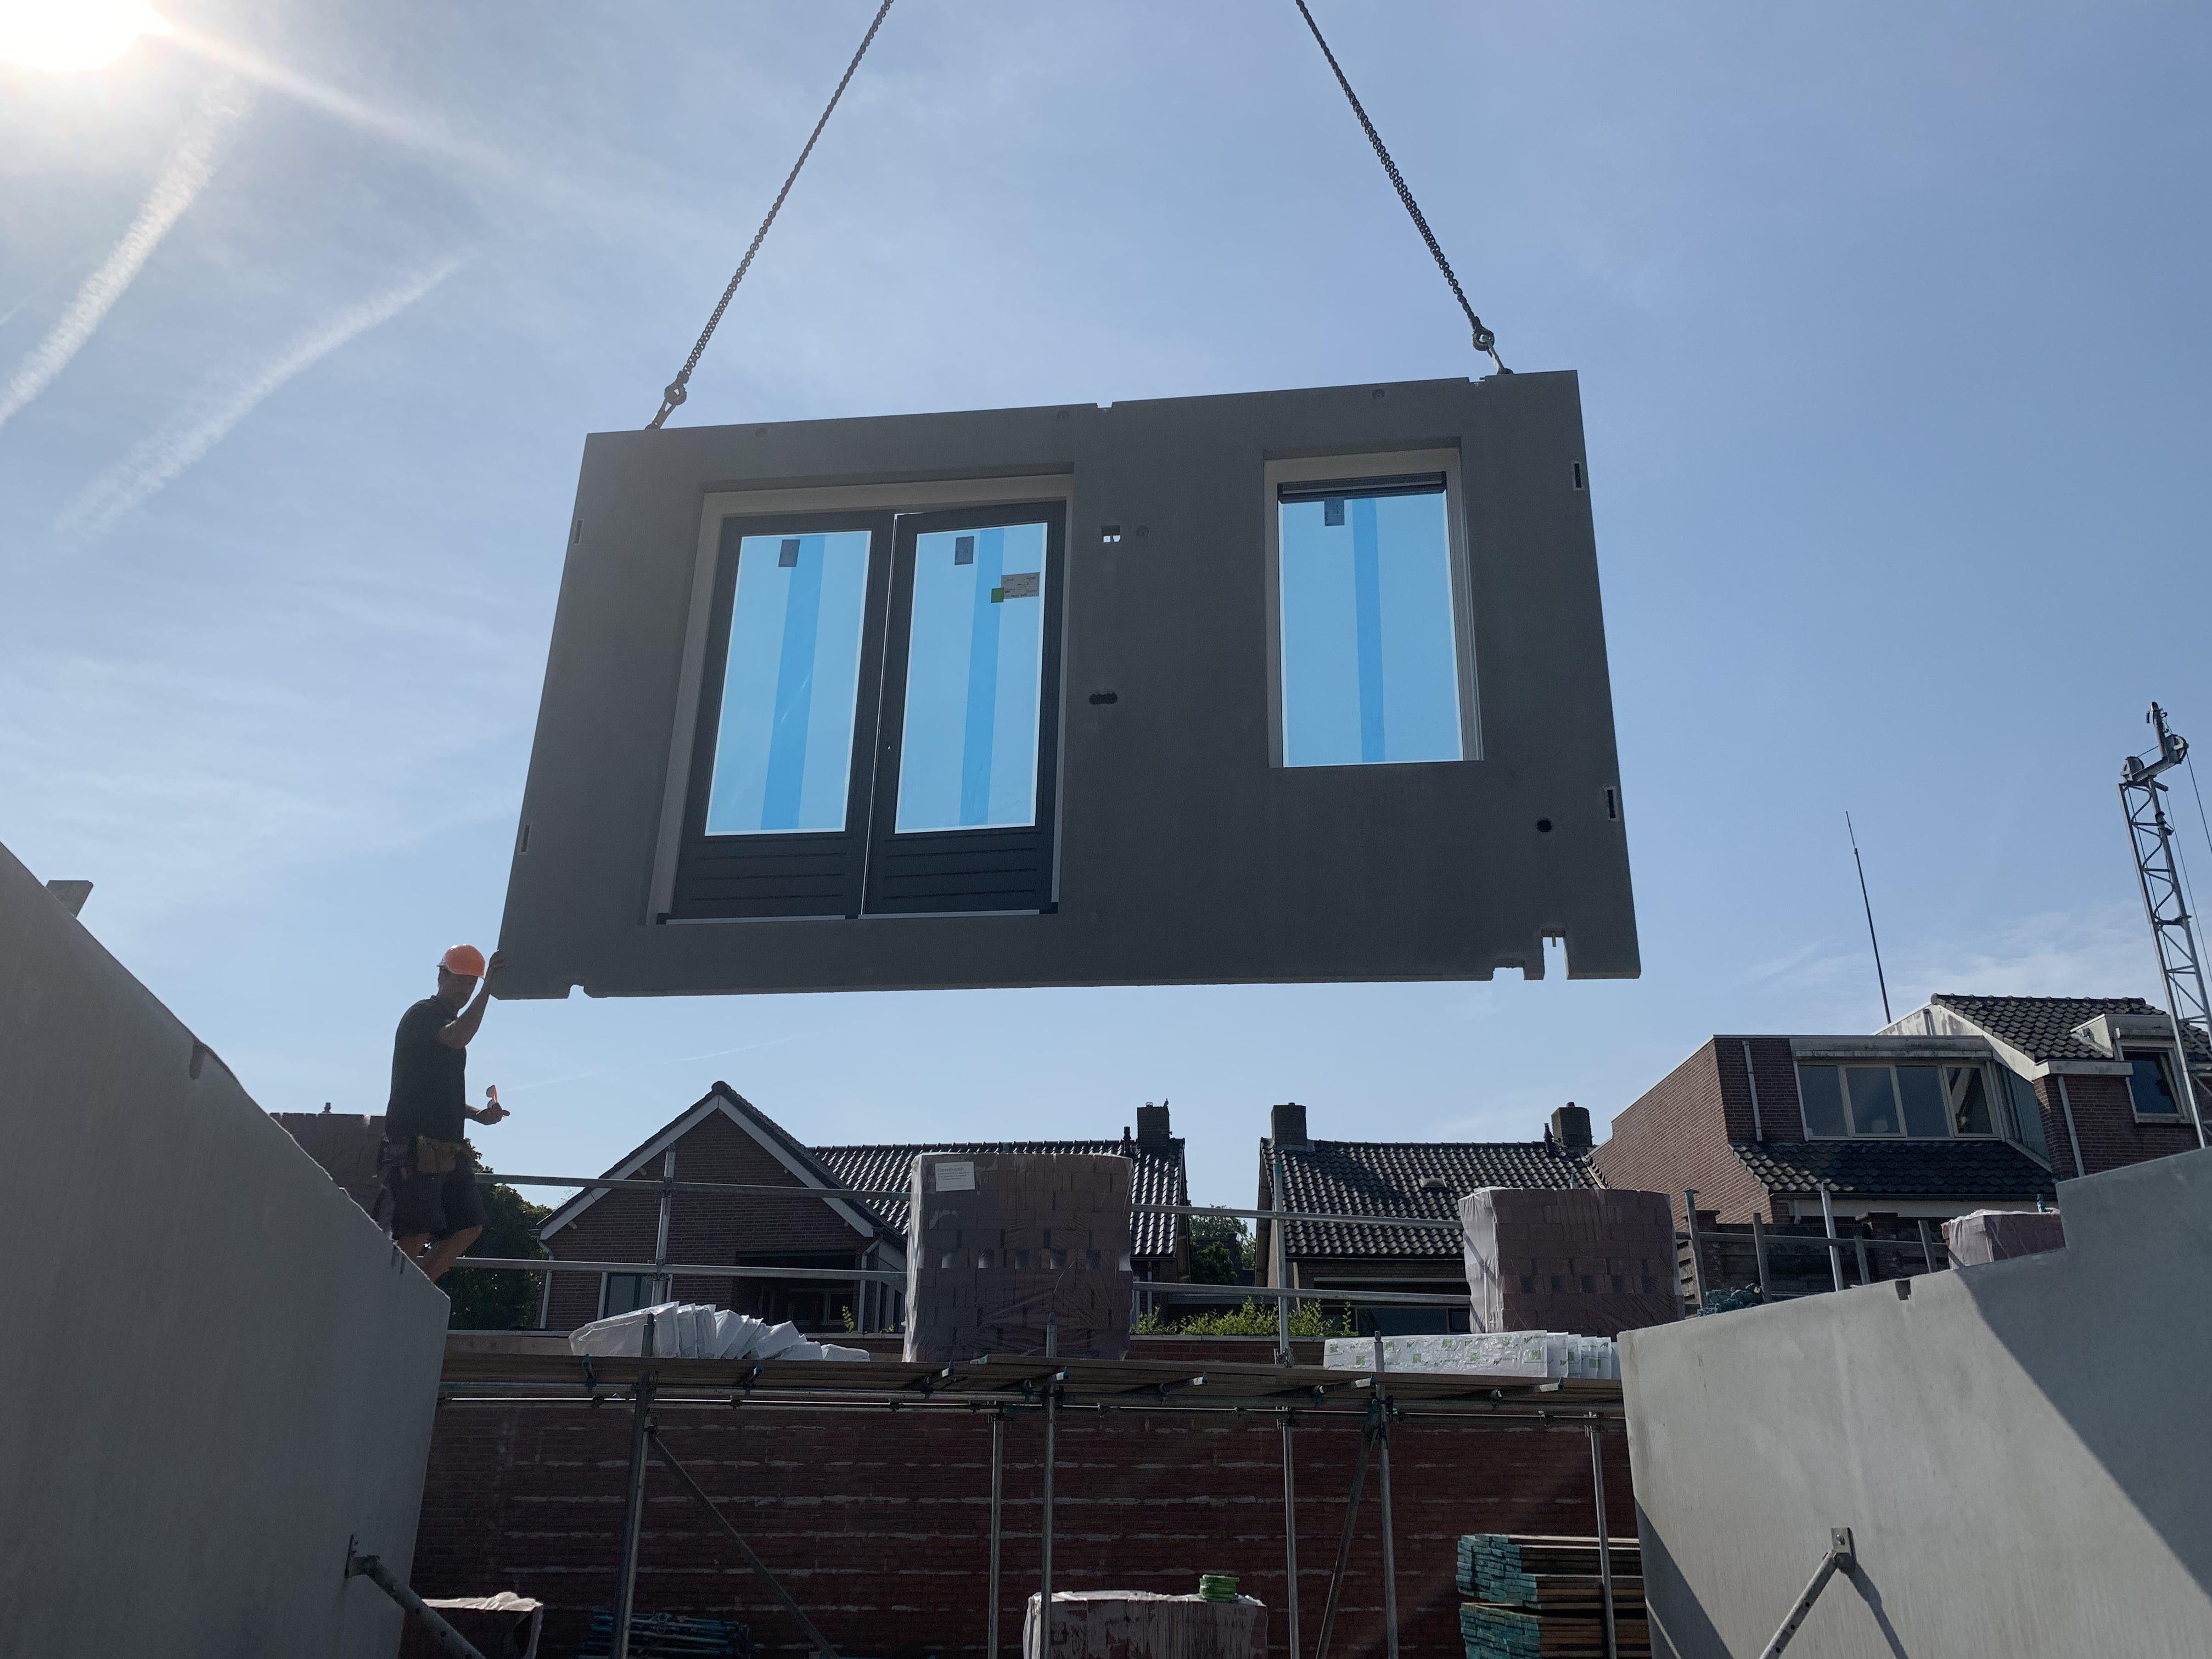 prefab-bouwonderdeel-smartcasco-witzand-bouwmaterialen